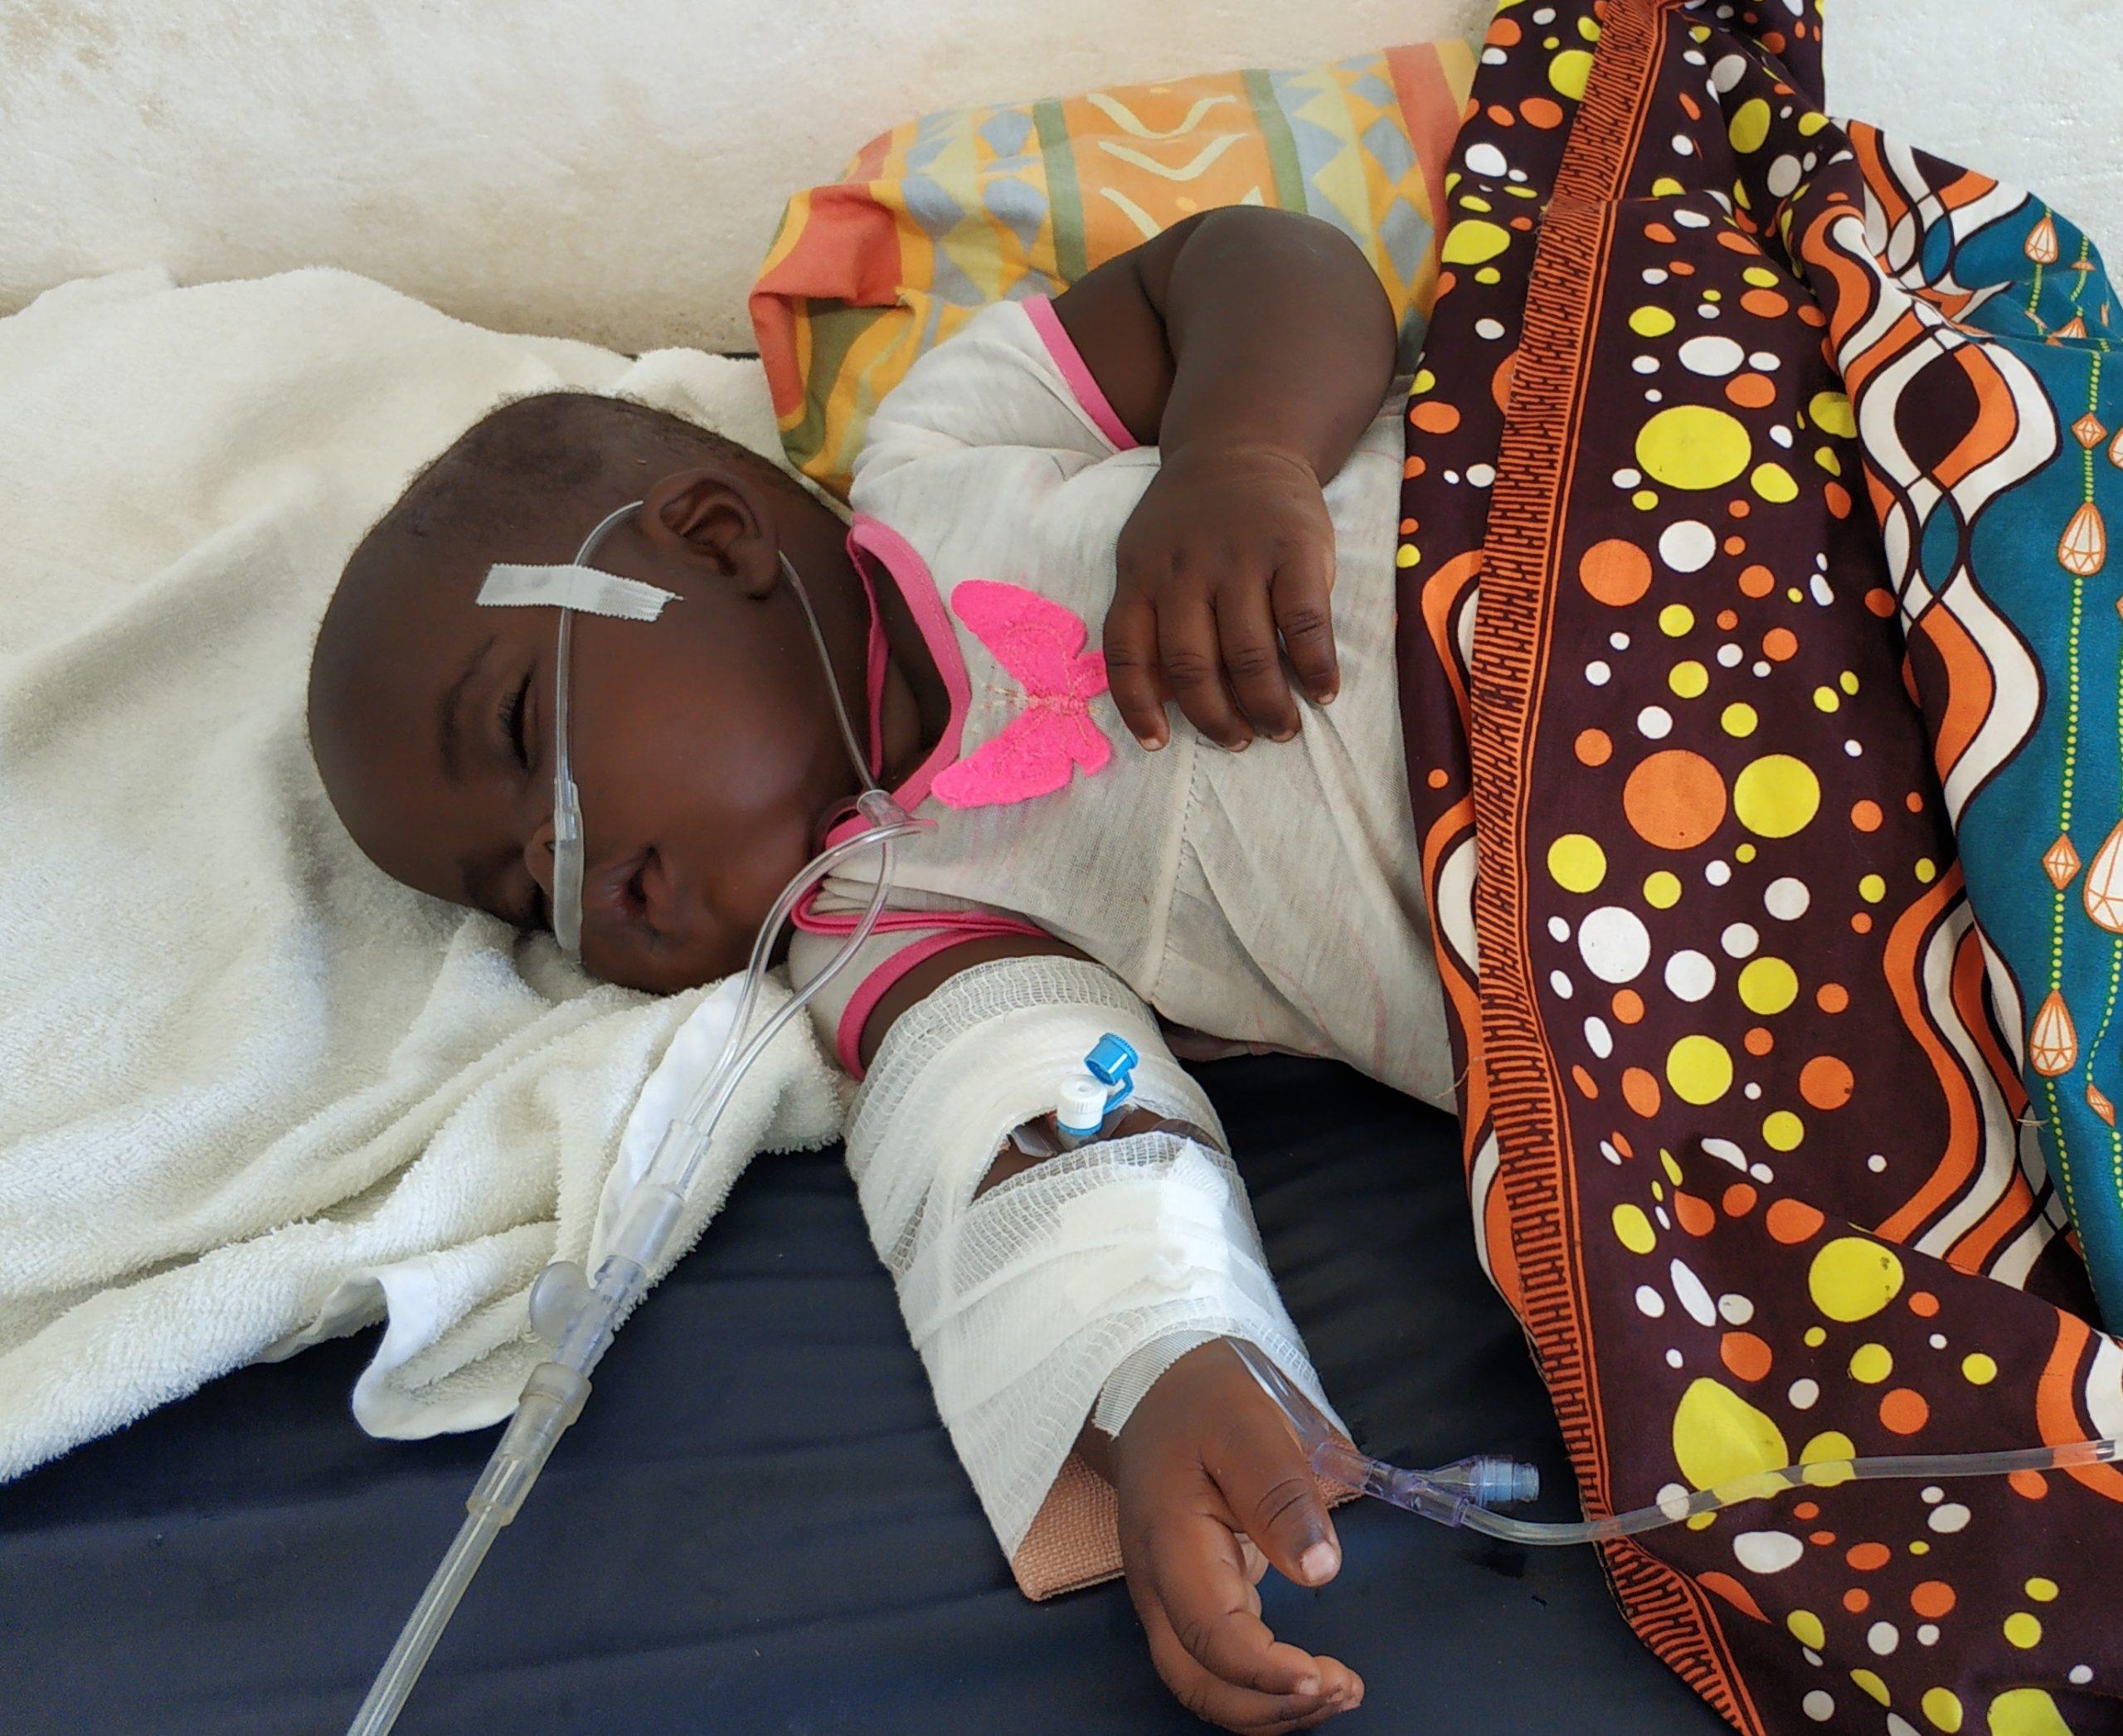 A toddler unconscious due to severe malaria